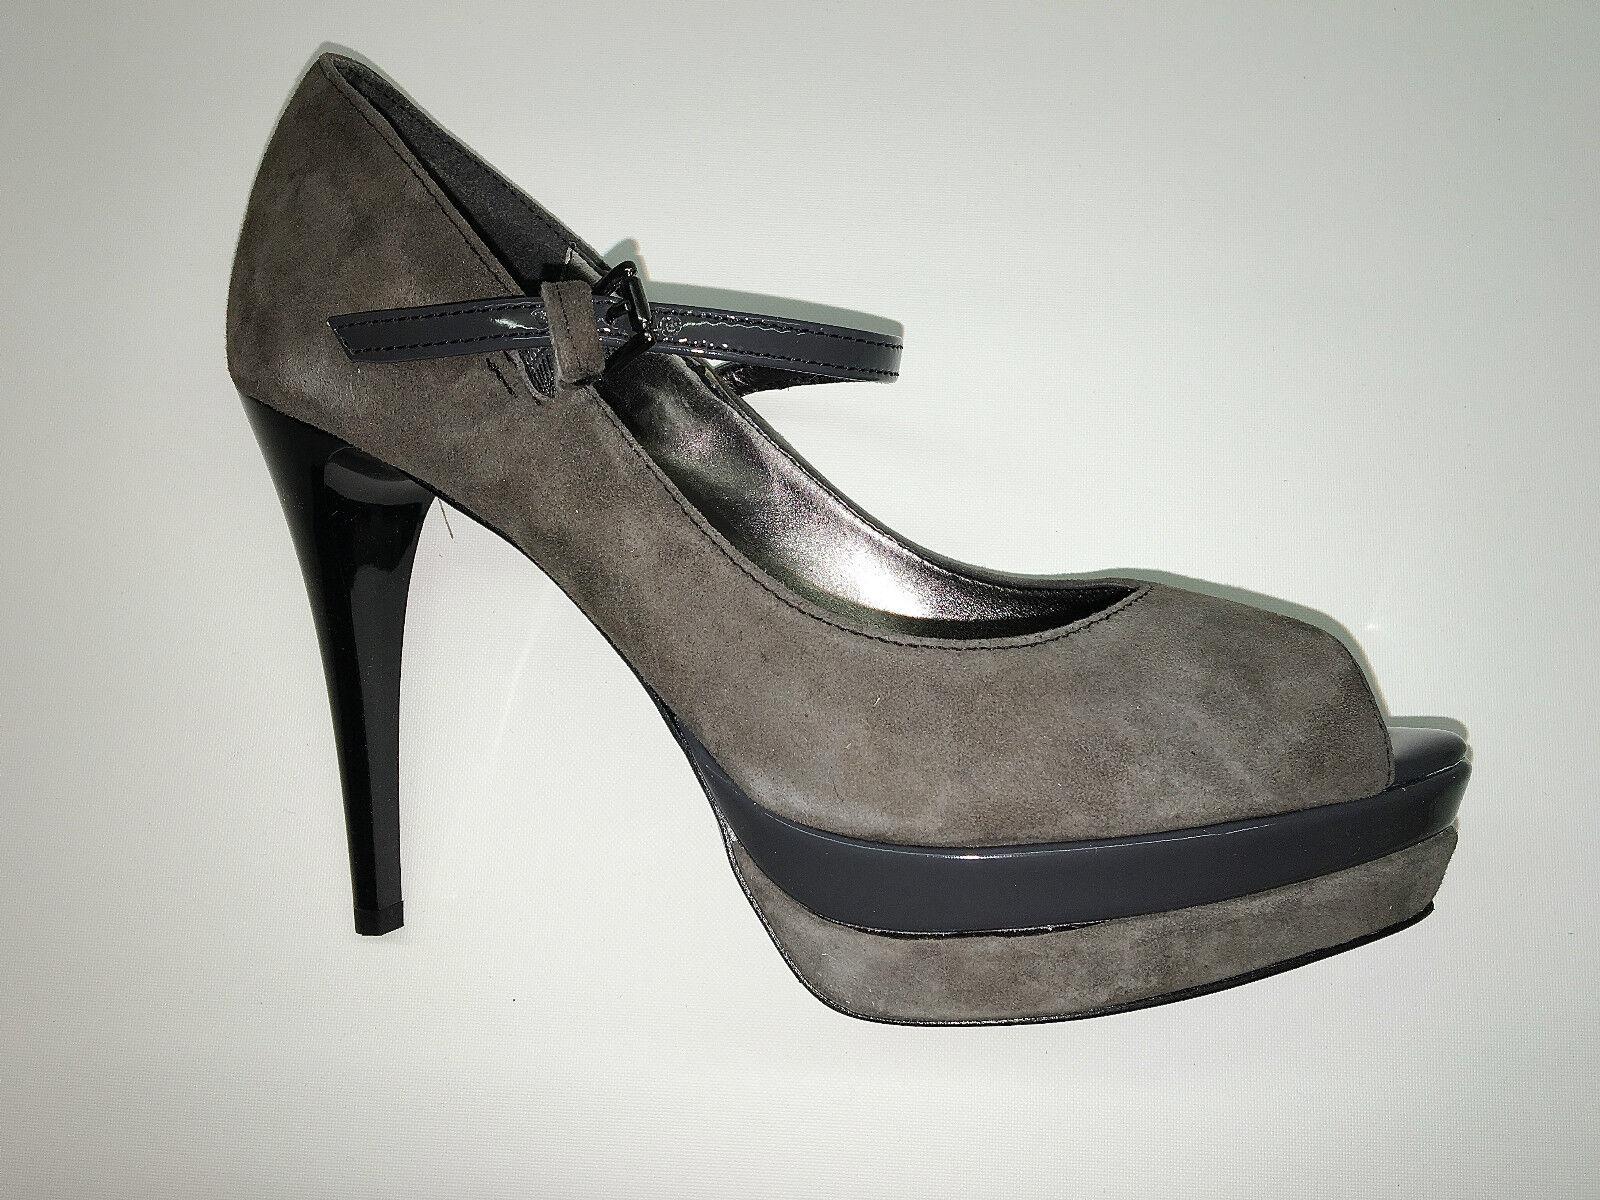 Designer Pumps PeepToes HIgh Heels von Ashley Brooke Grau Gr. 38